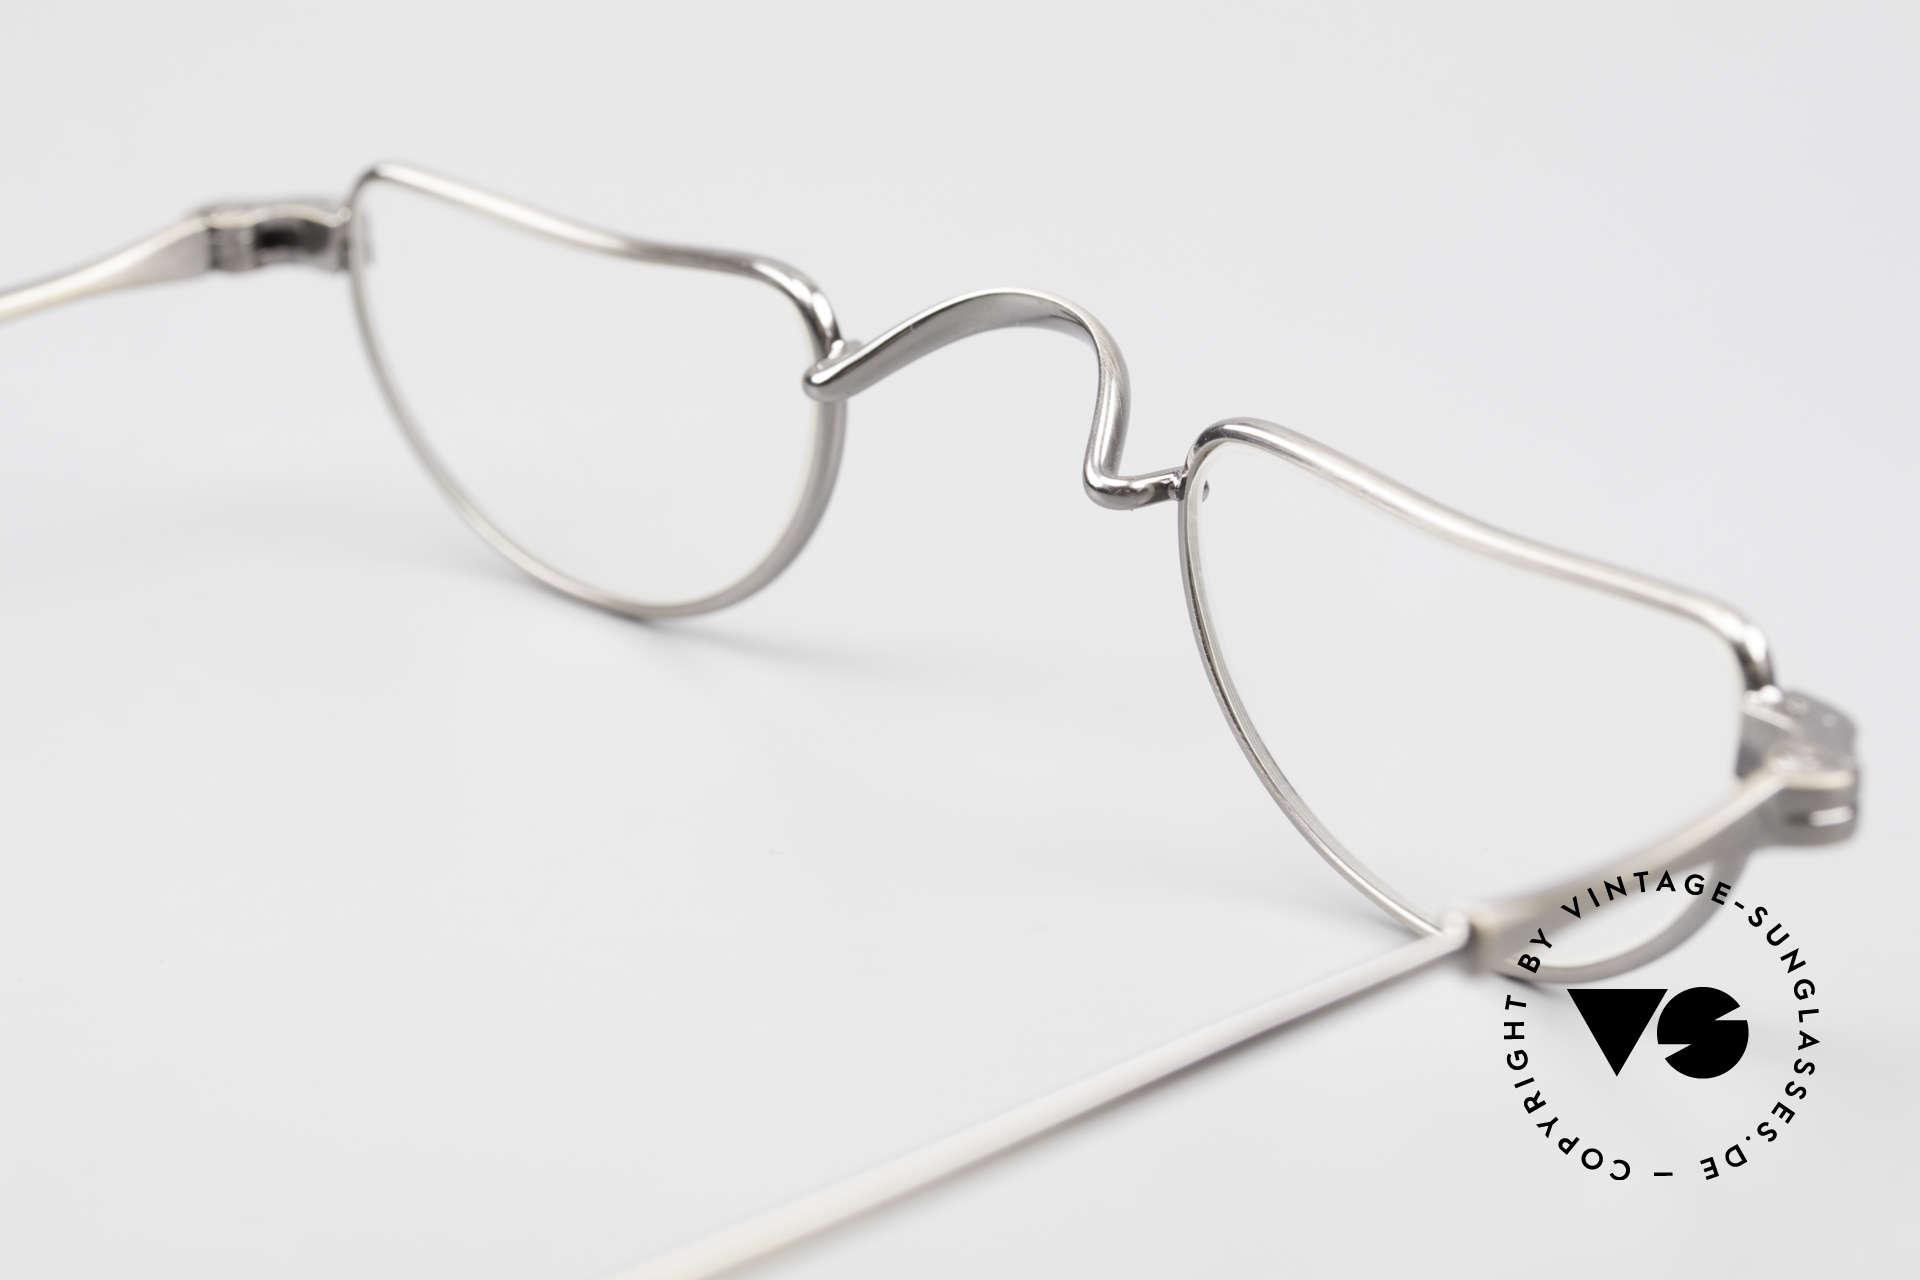 Lunor II 07 Classic Reading Eyeglasses, NO RETRO EYEGLASSES; but a luxury vintage Original, Made for Men and Women